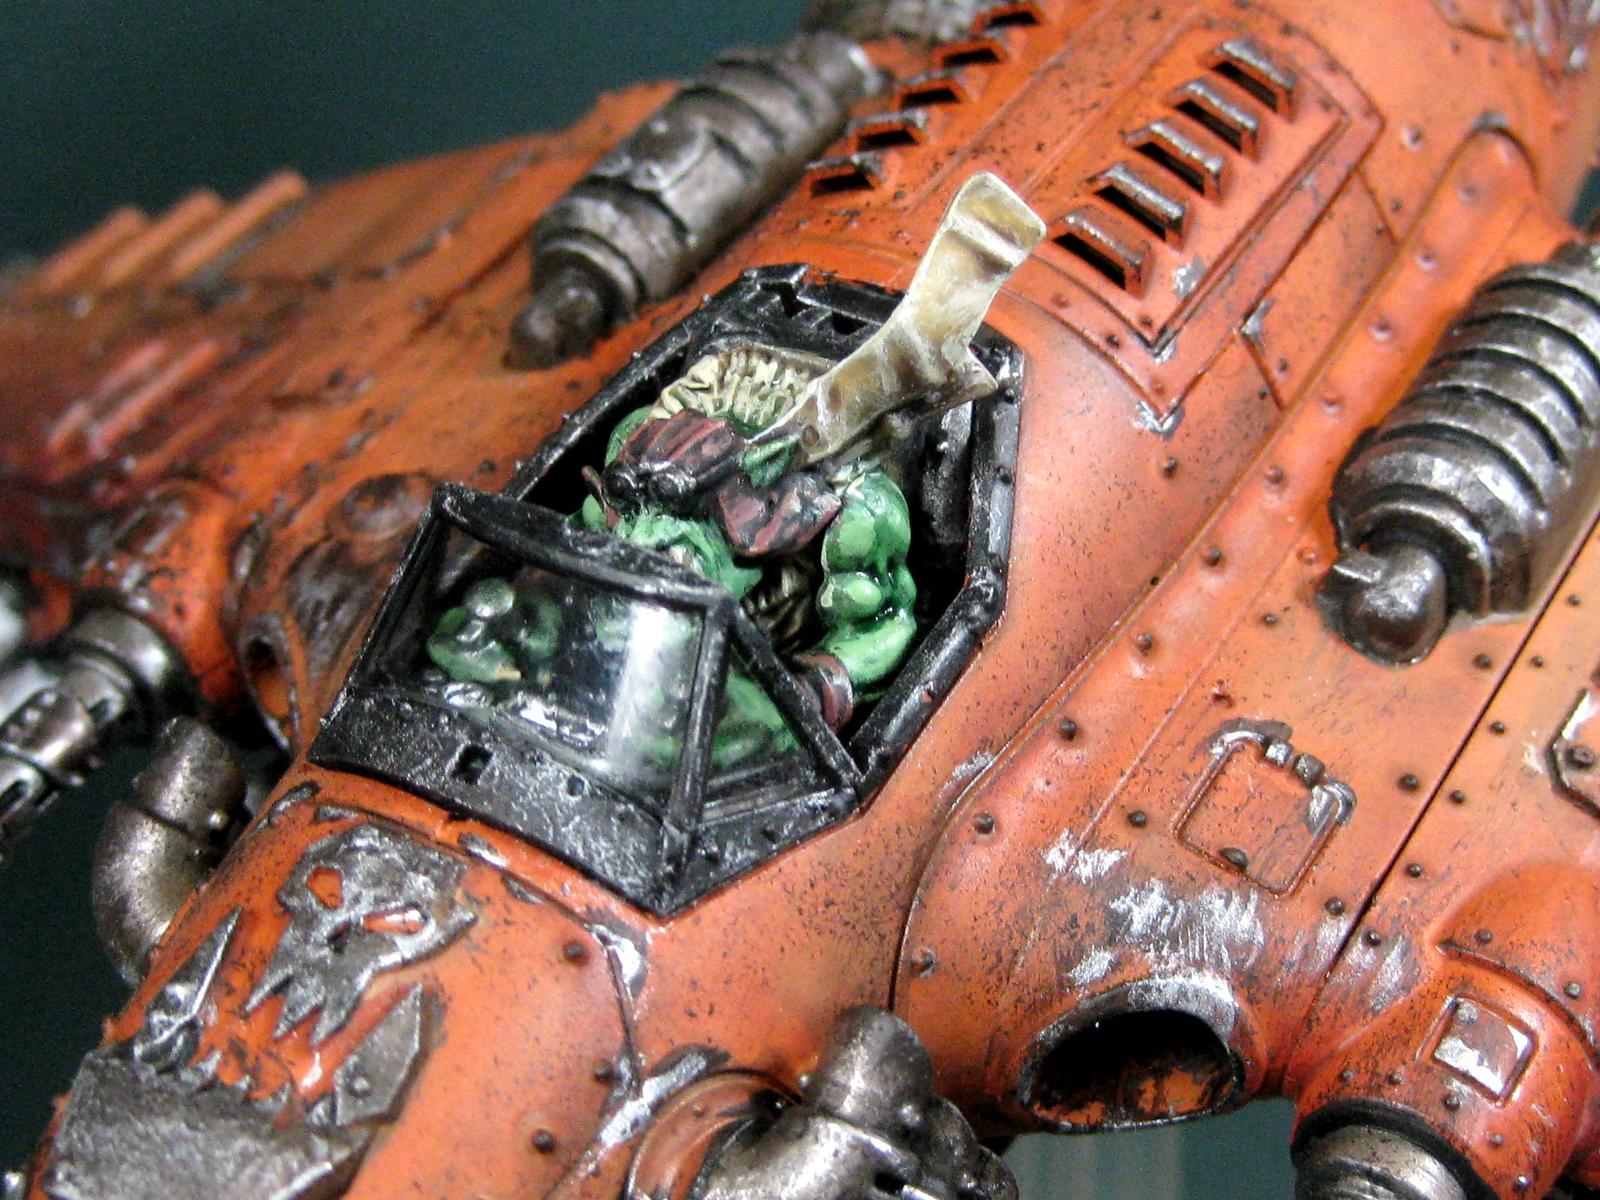 Bommer, Burna Boyz, Detail, Orks, Warhammer 40,000